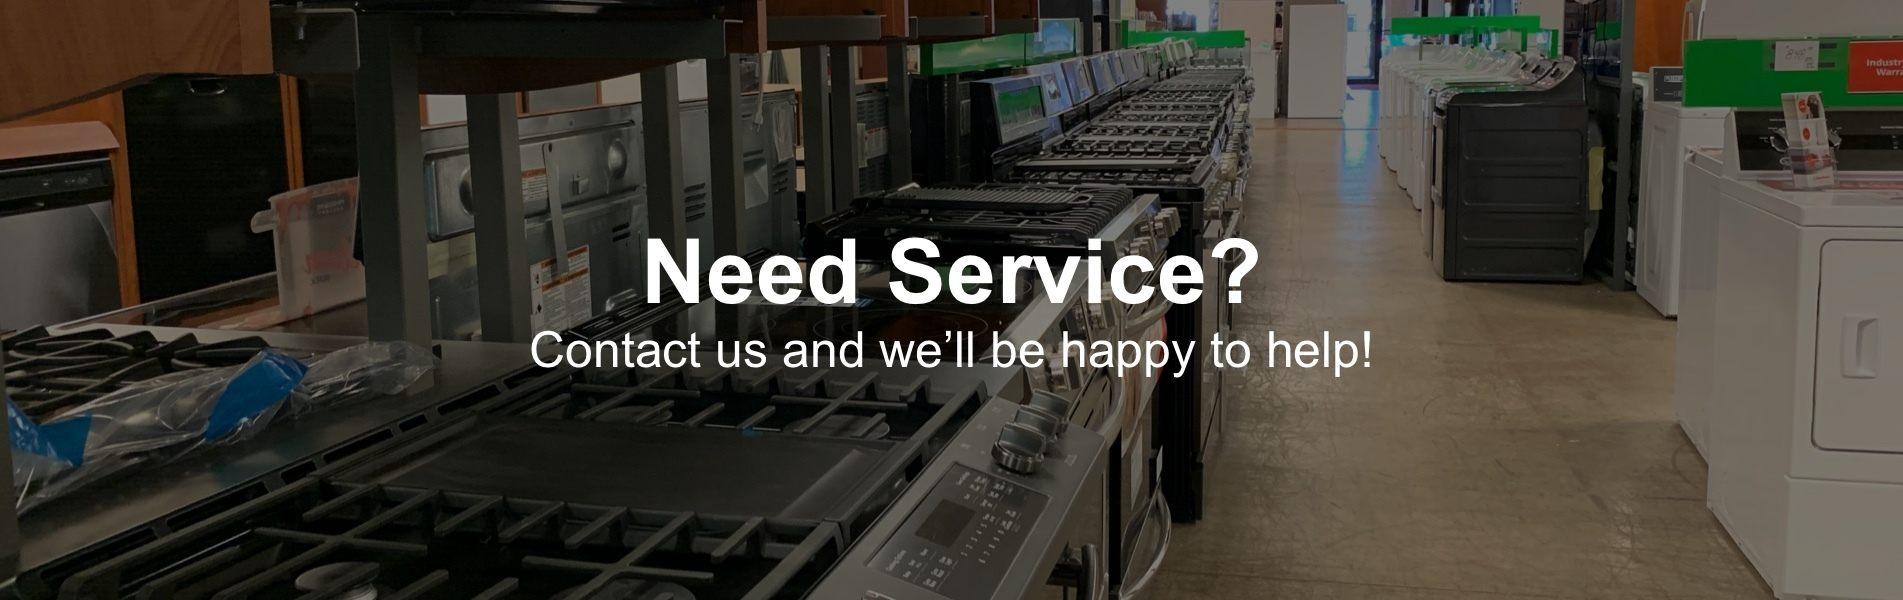 Dunmore: Need Service?